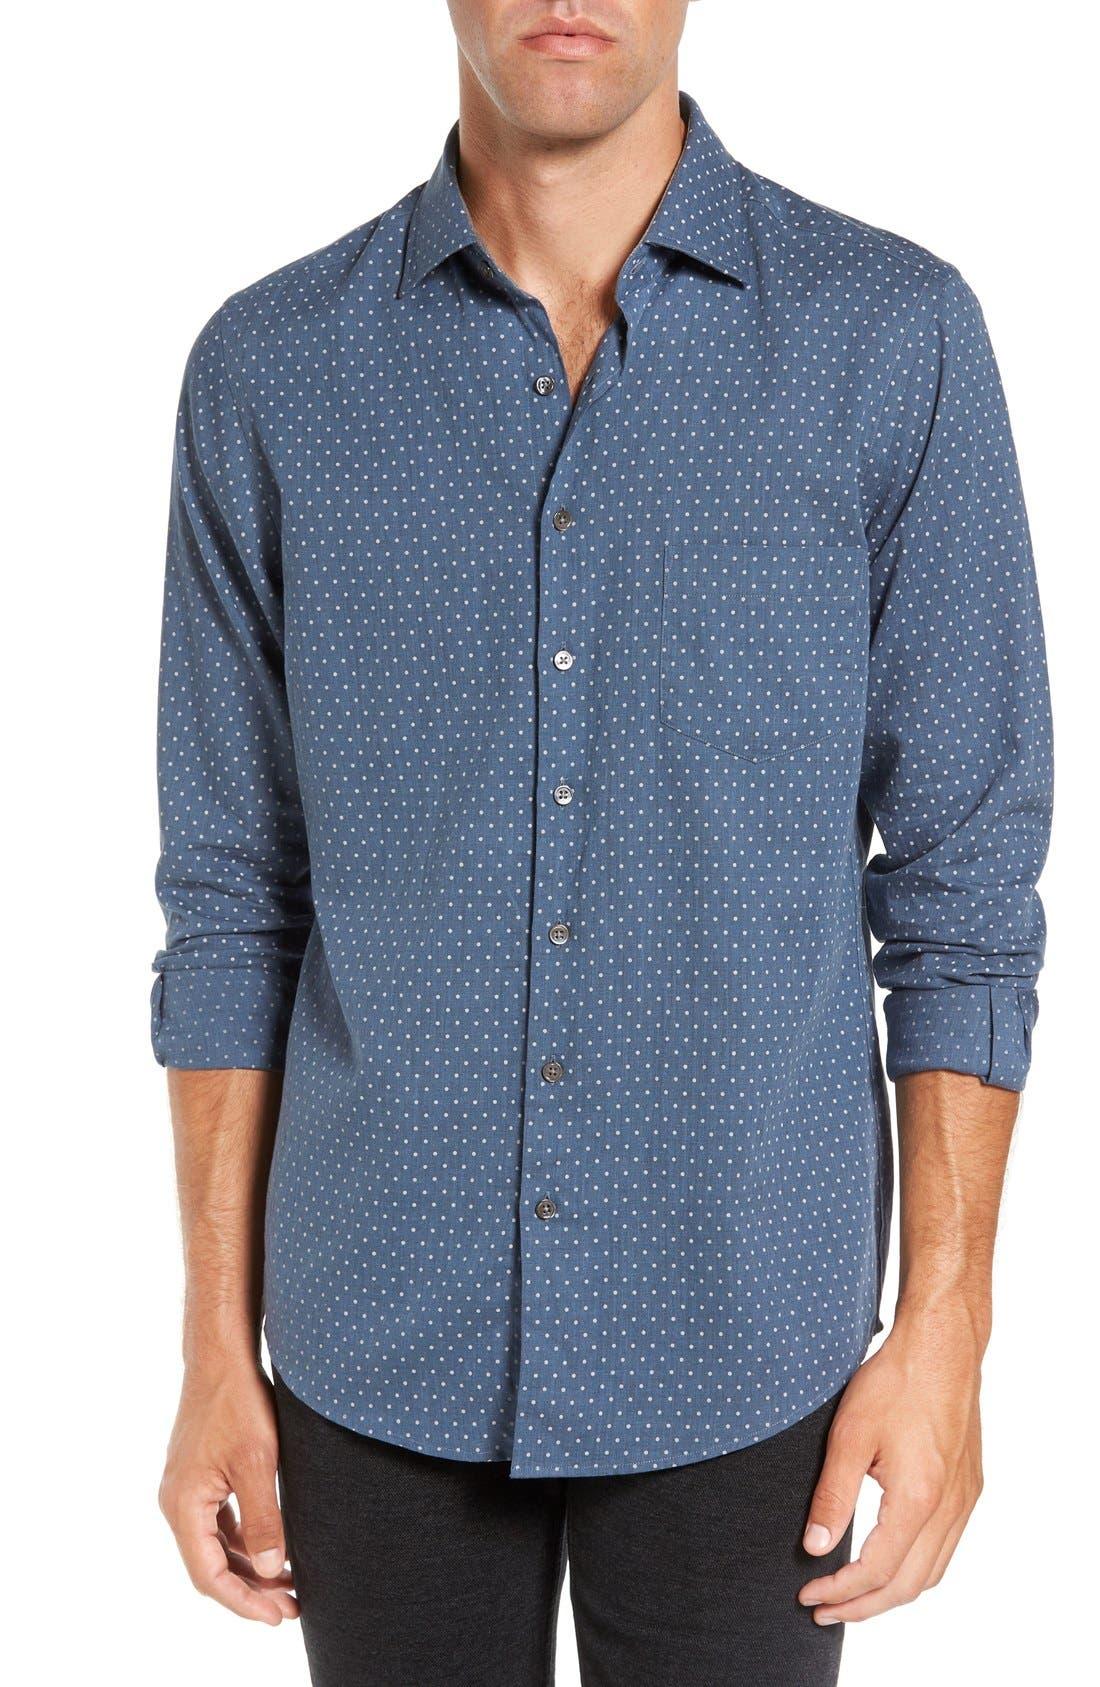 Image of RODD AND GUNN Kennaway Long Sleeve Sports Fit Shirt